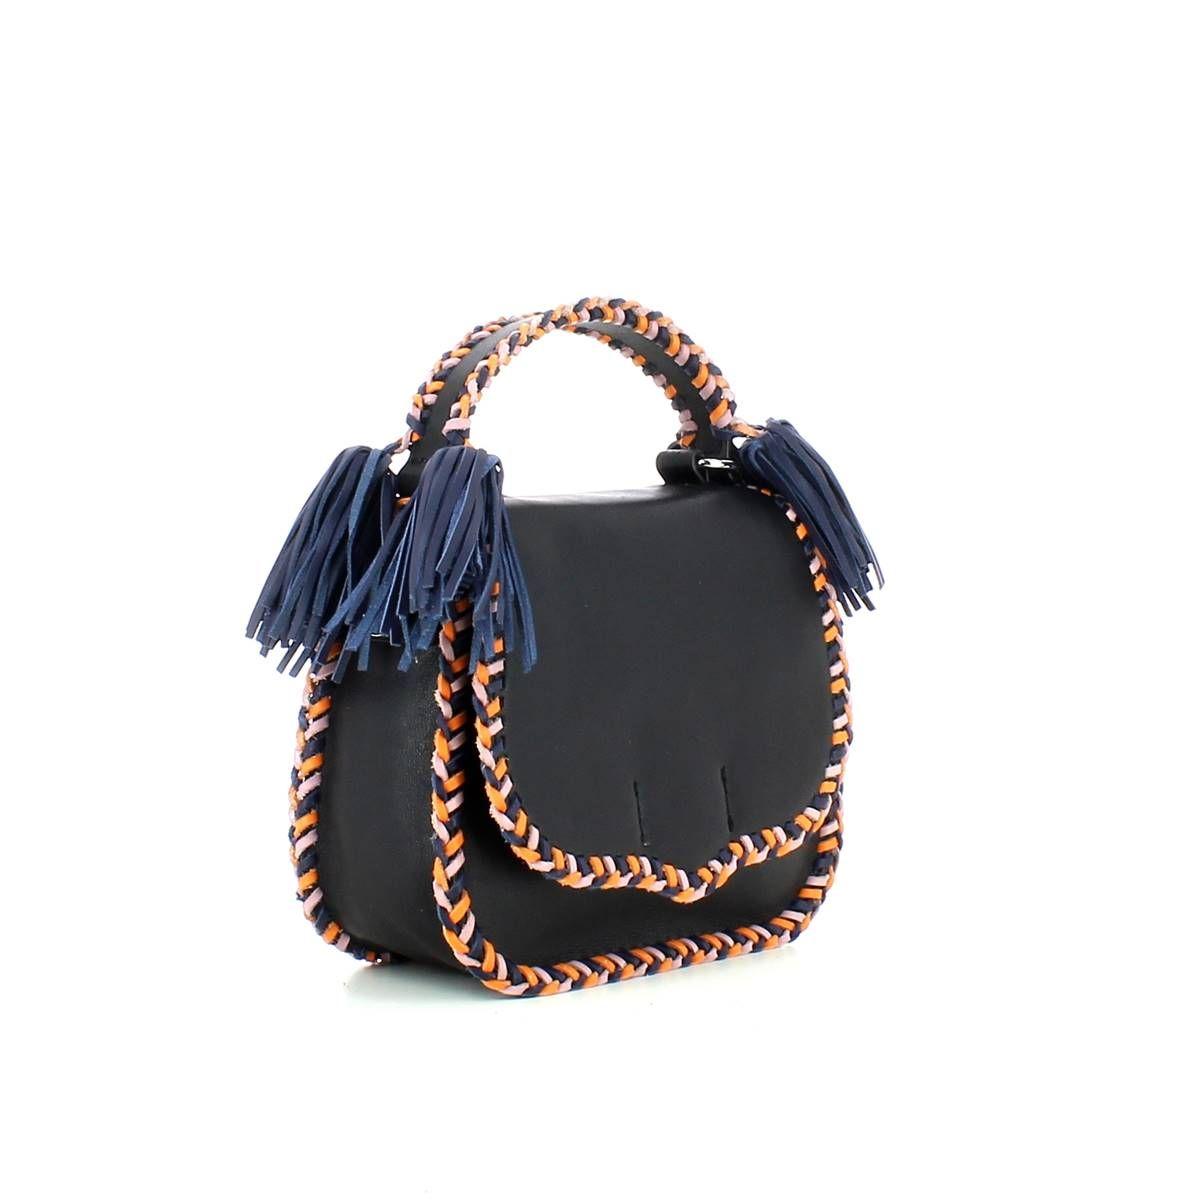 Rebecca Minkoff, Chase Medium Saddle Bag BLACK MULTI